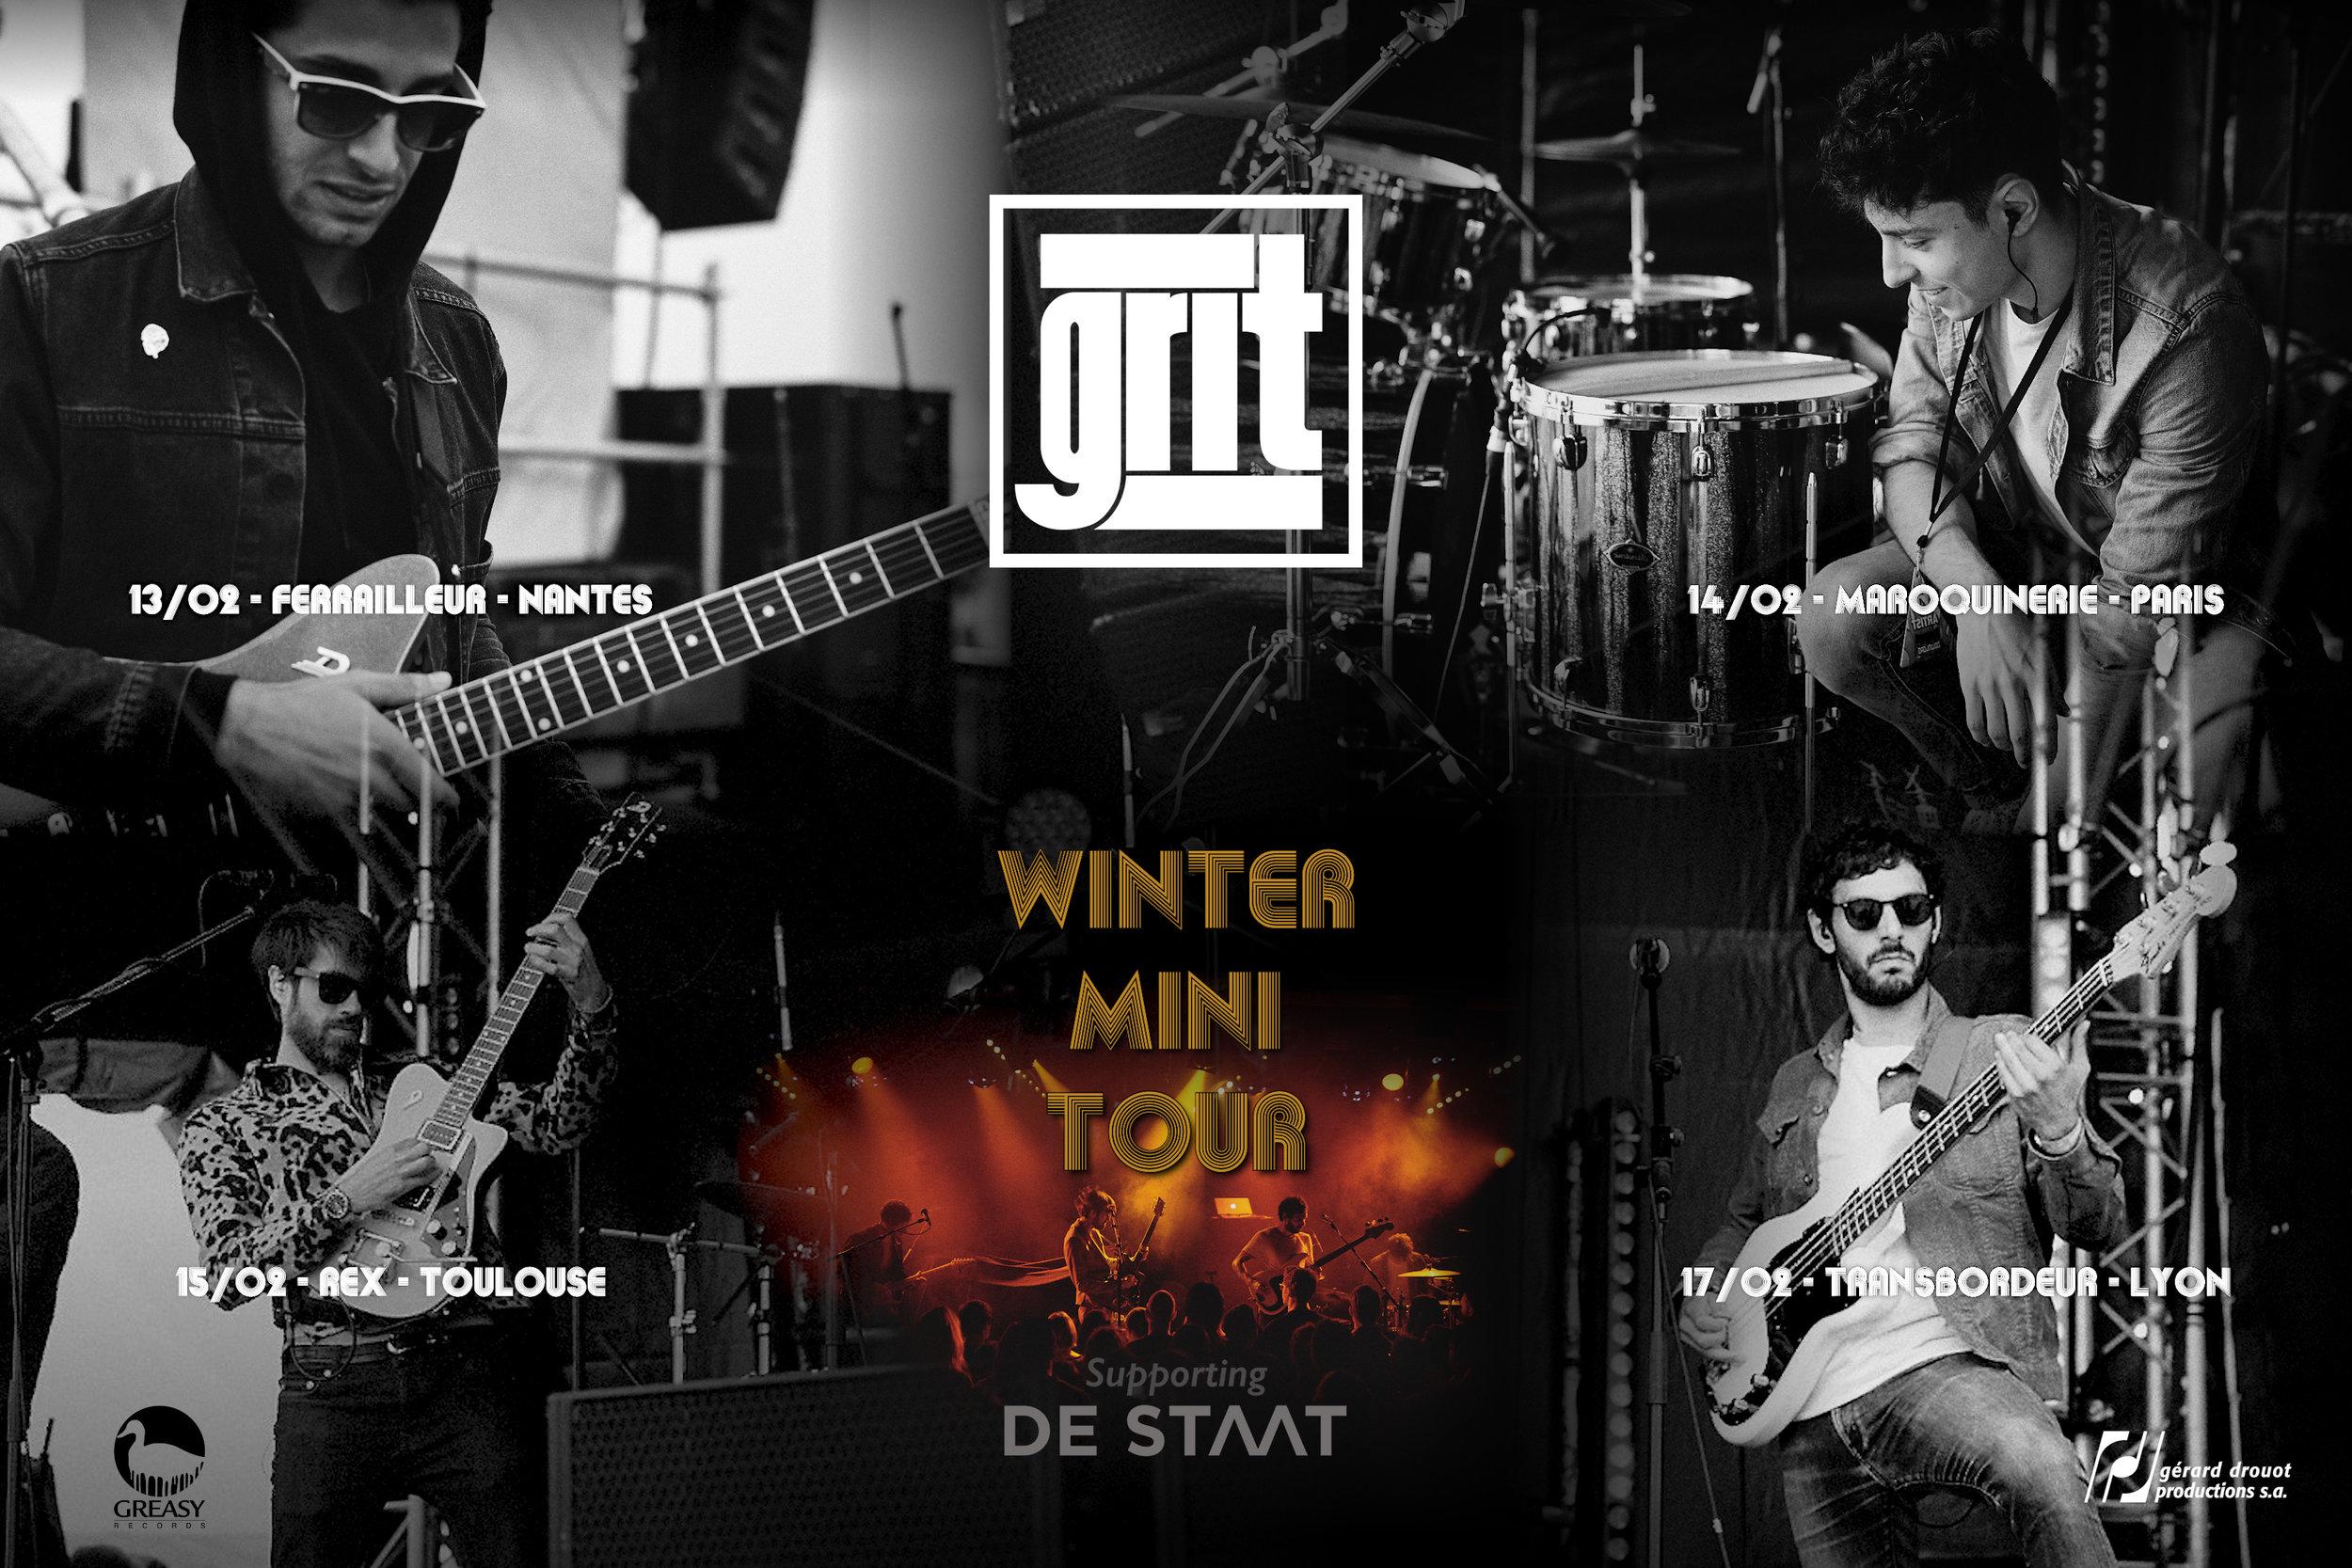 WINTER MINI TOUR WIDE.JPG